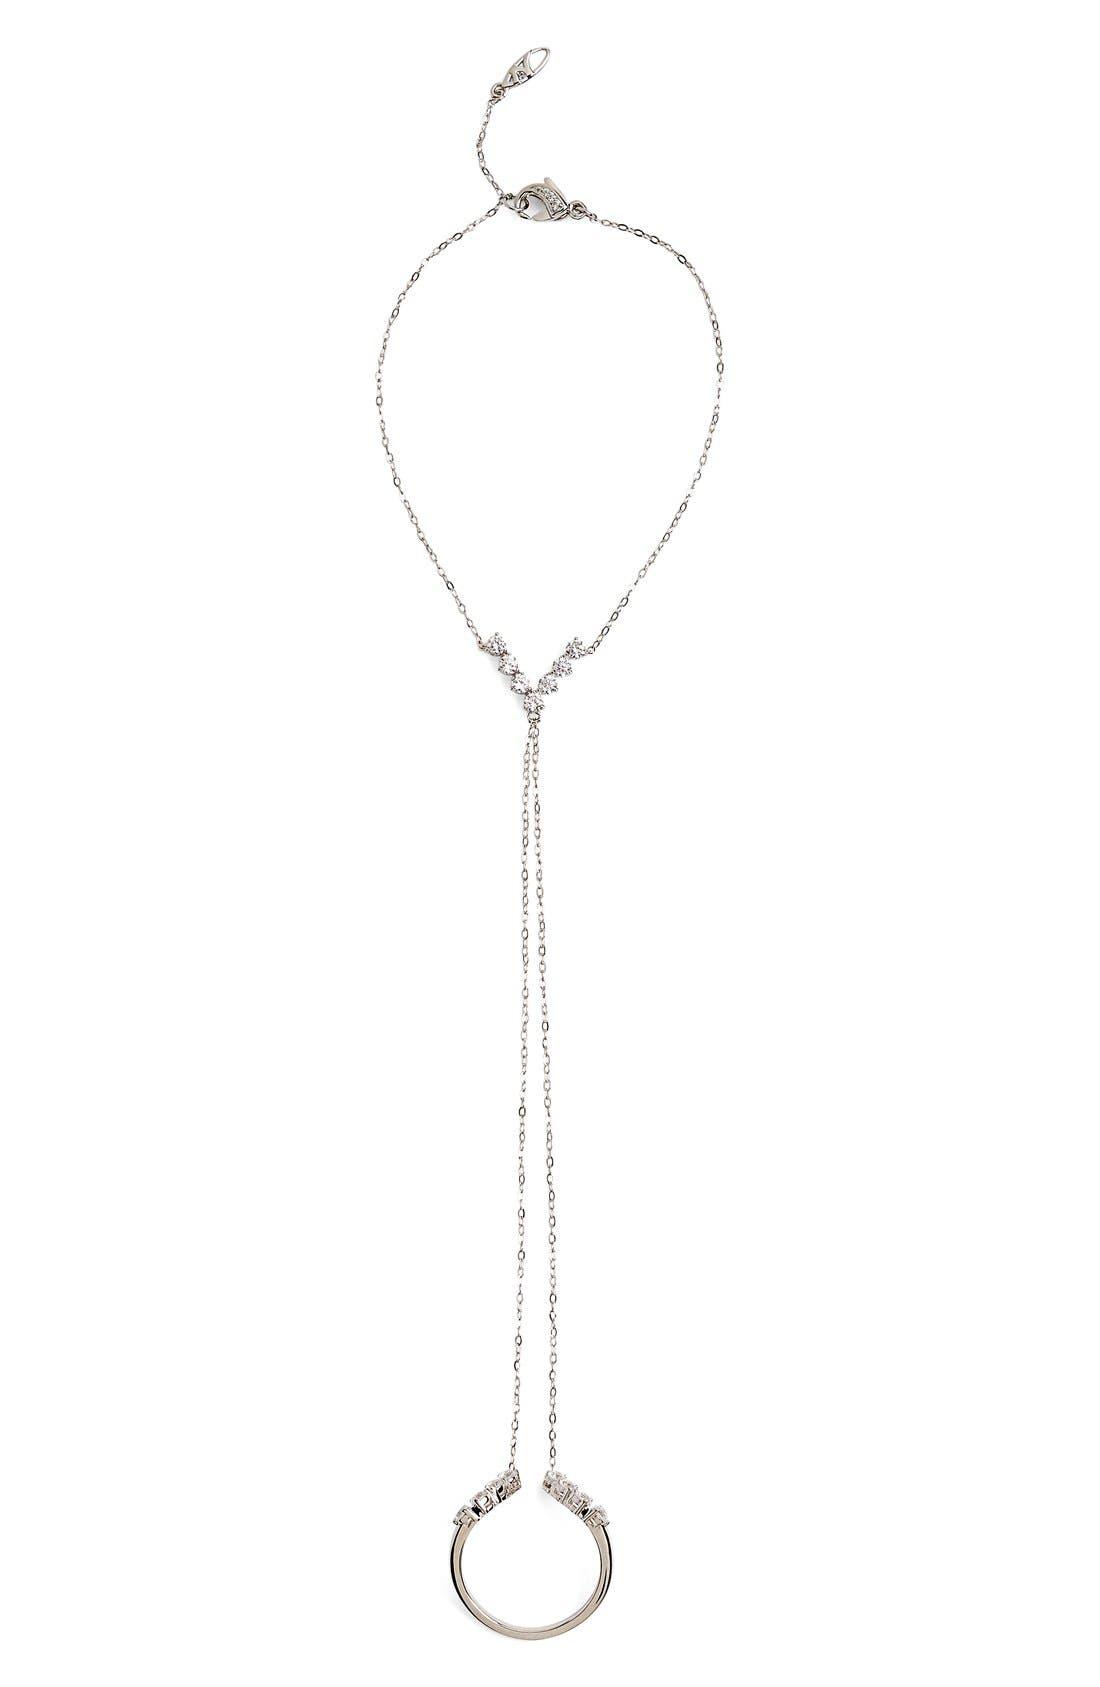 Main Image - Nadri 'Salome' Cubic Zirconia Hand Chain